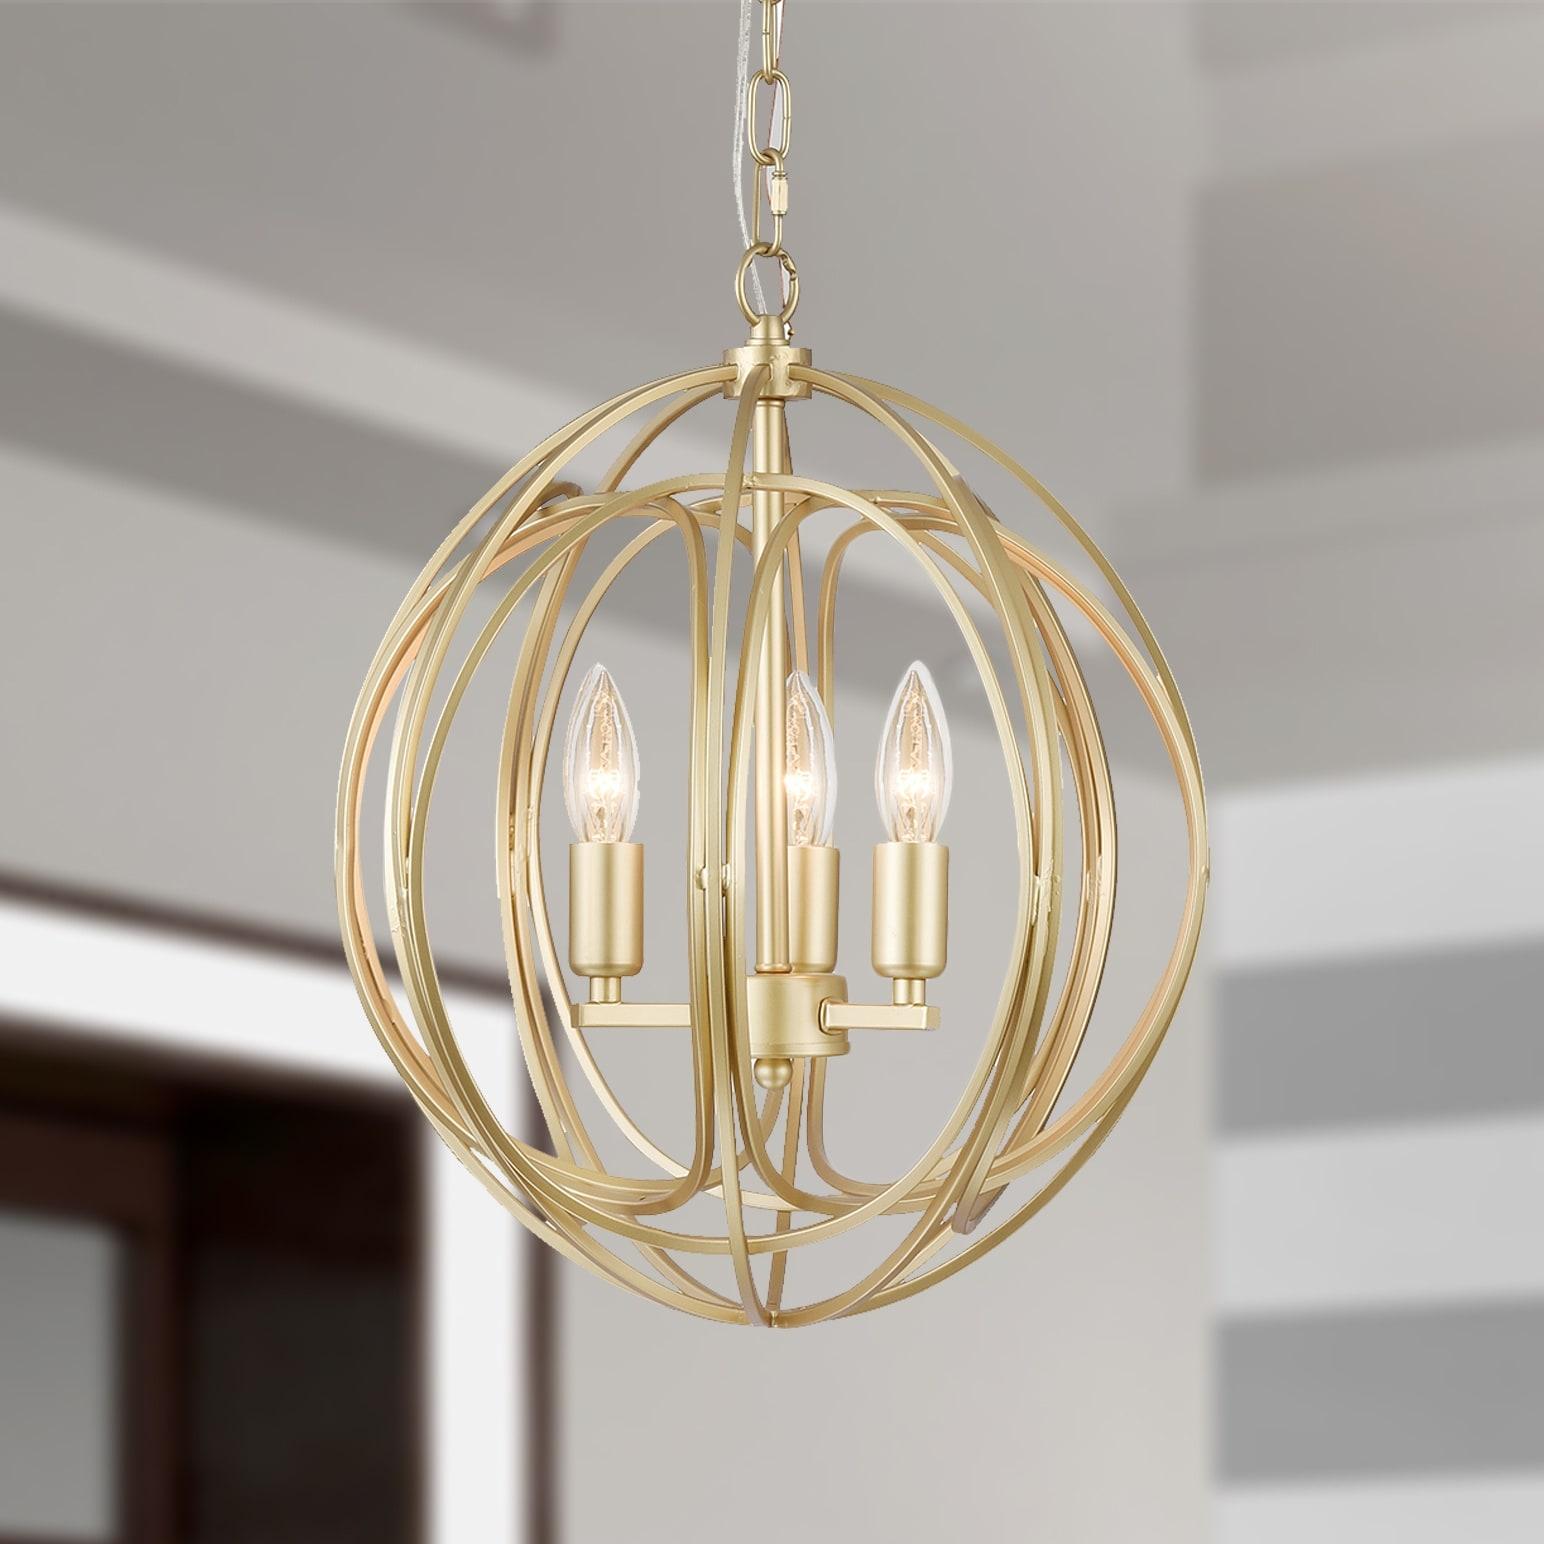 Shop Nelpin Soft Brushed Gold 3 Light Globe Cage Pendant On Sale Overstock 21340122